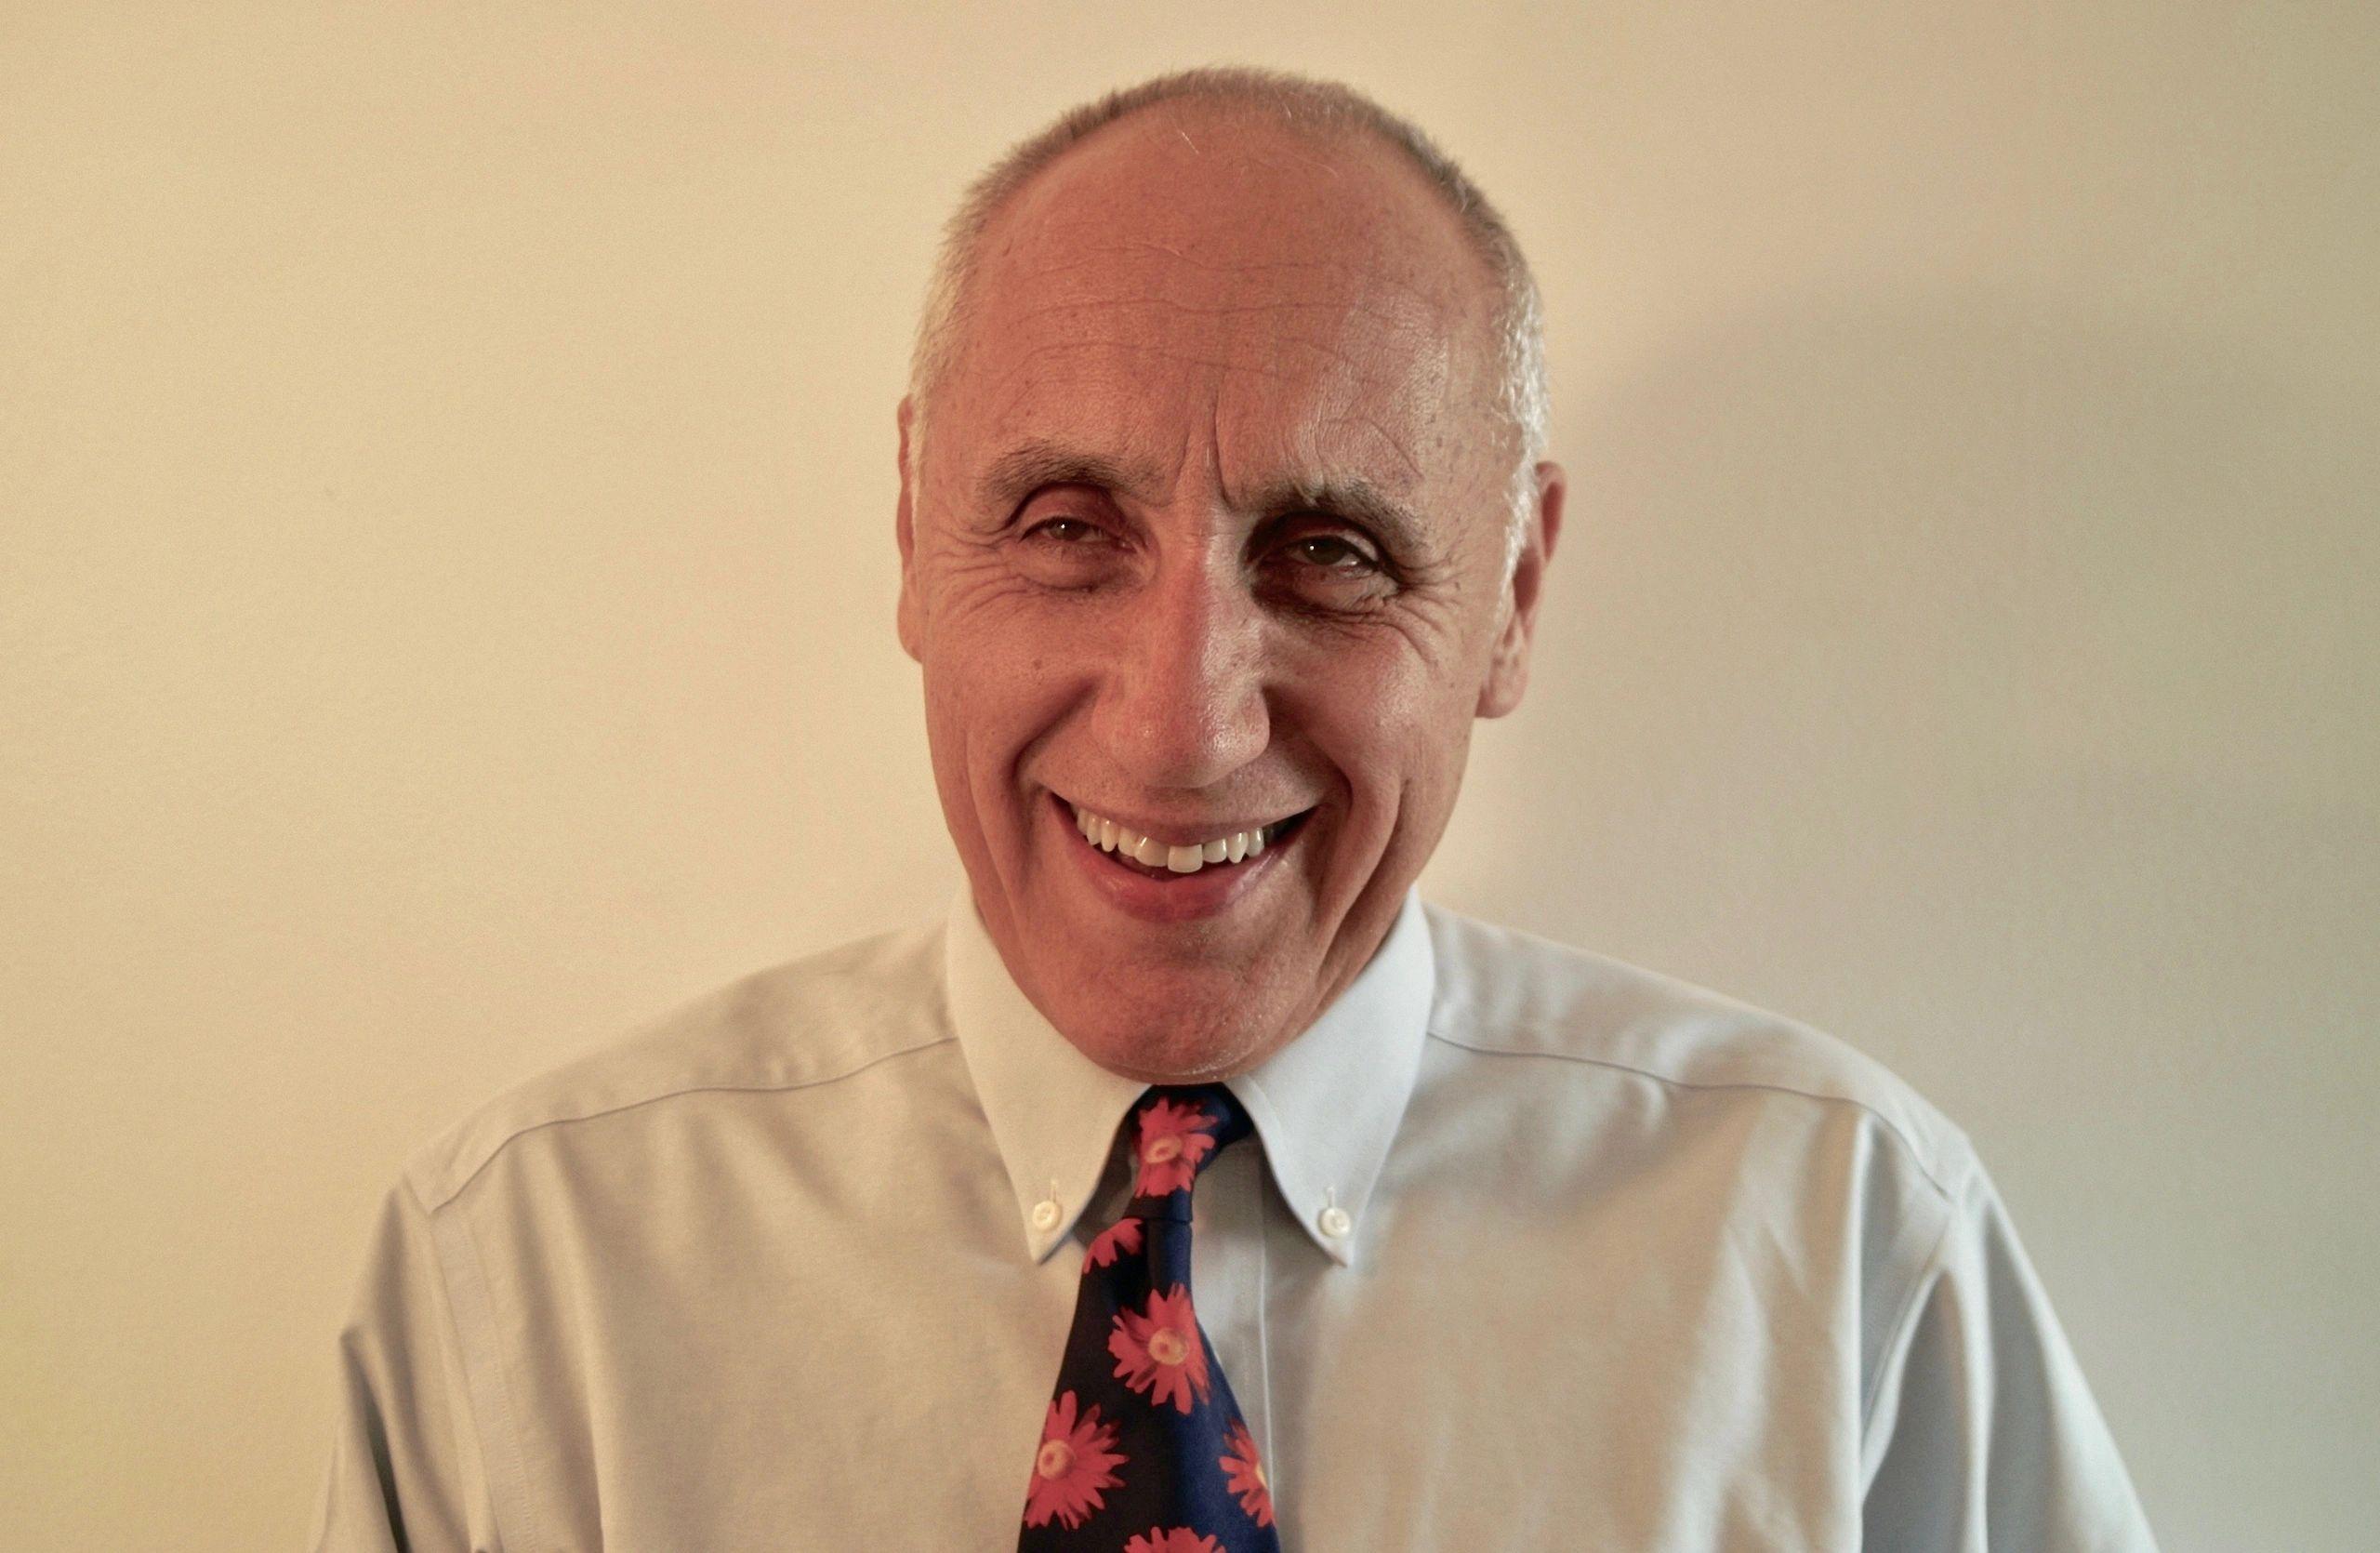 Peter A Plumeri, DO - Gastroenterology Doctor, Colonoscopy